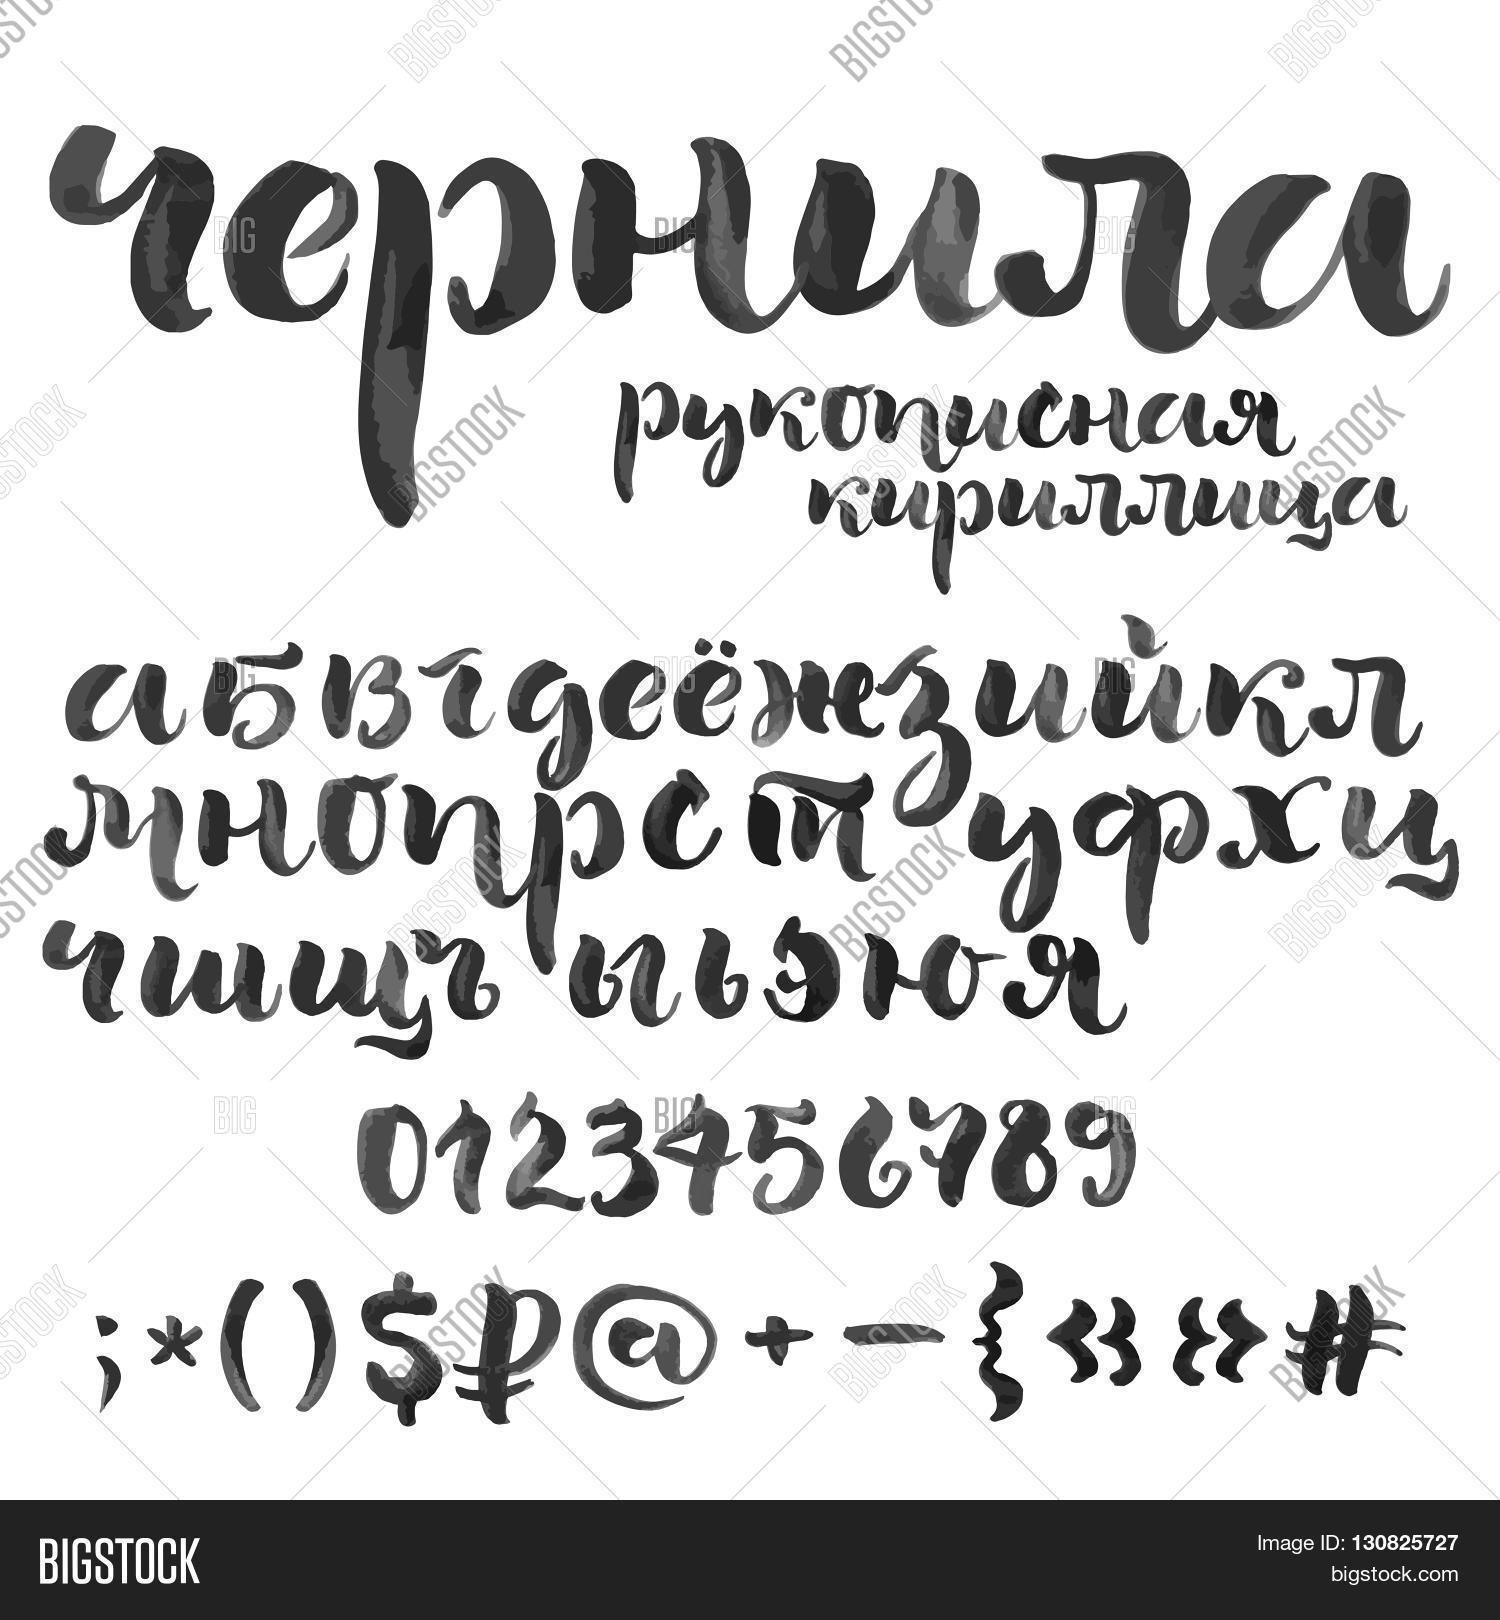 f70afa41234 Brush script cyrillic ink alphabet. Title in Russian means Ink -  handwritten cyrillic. Lowercase